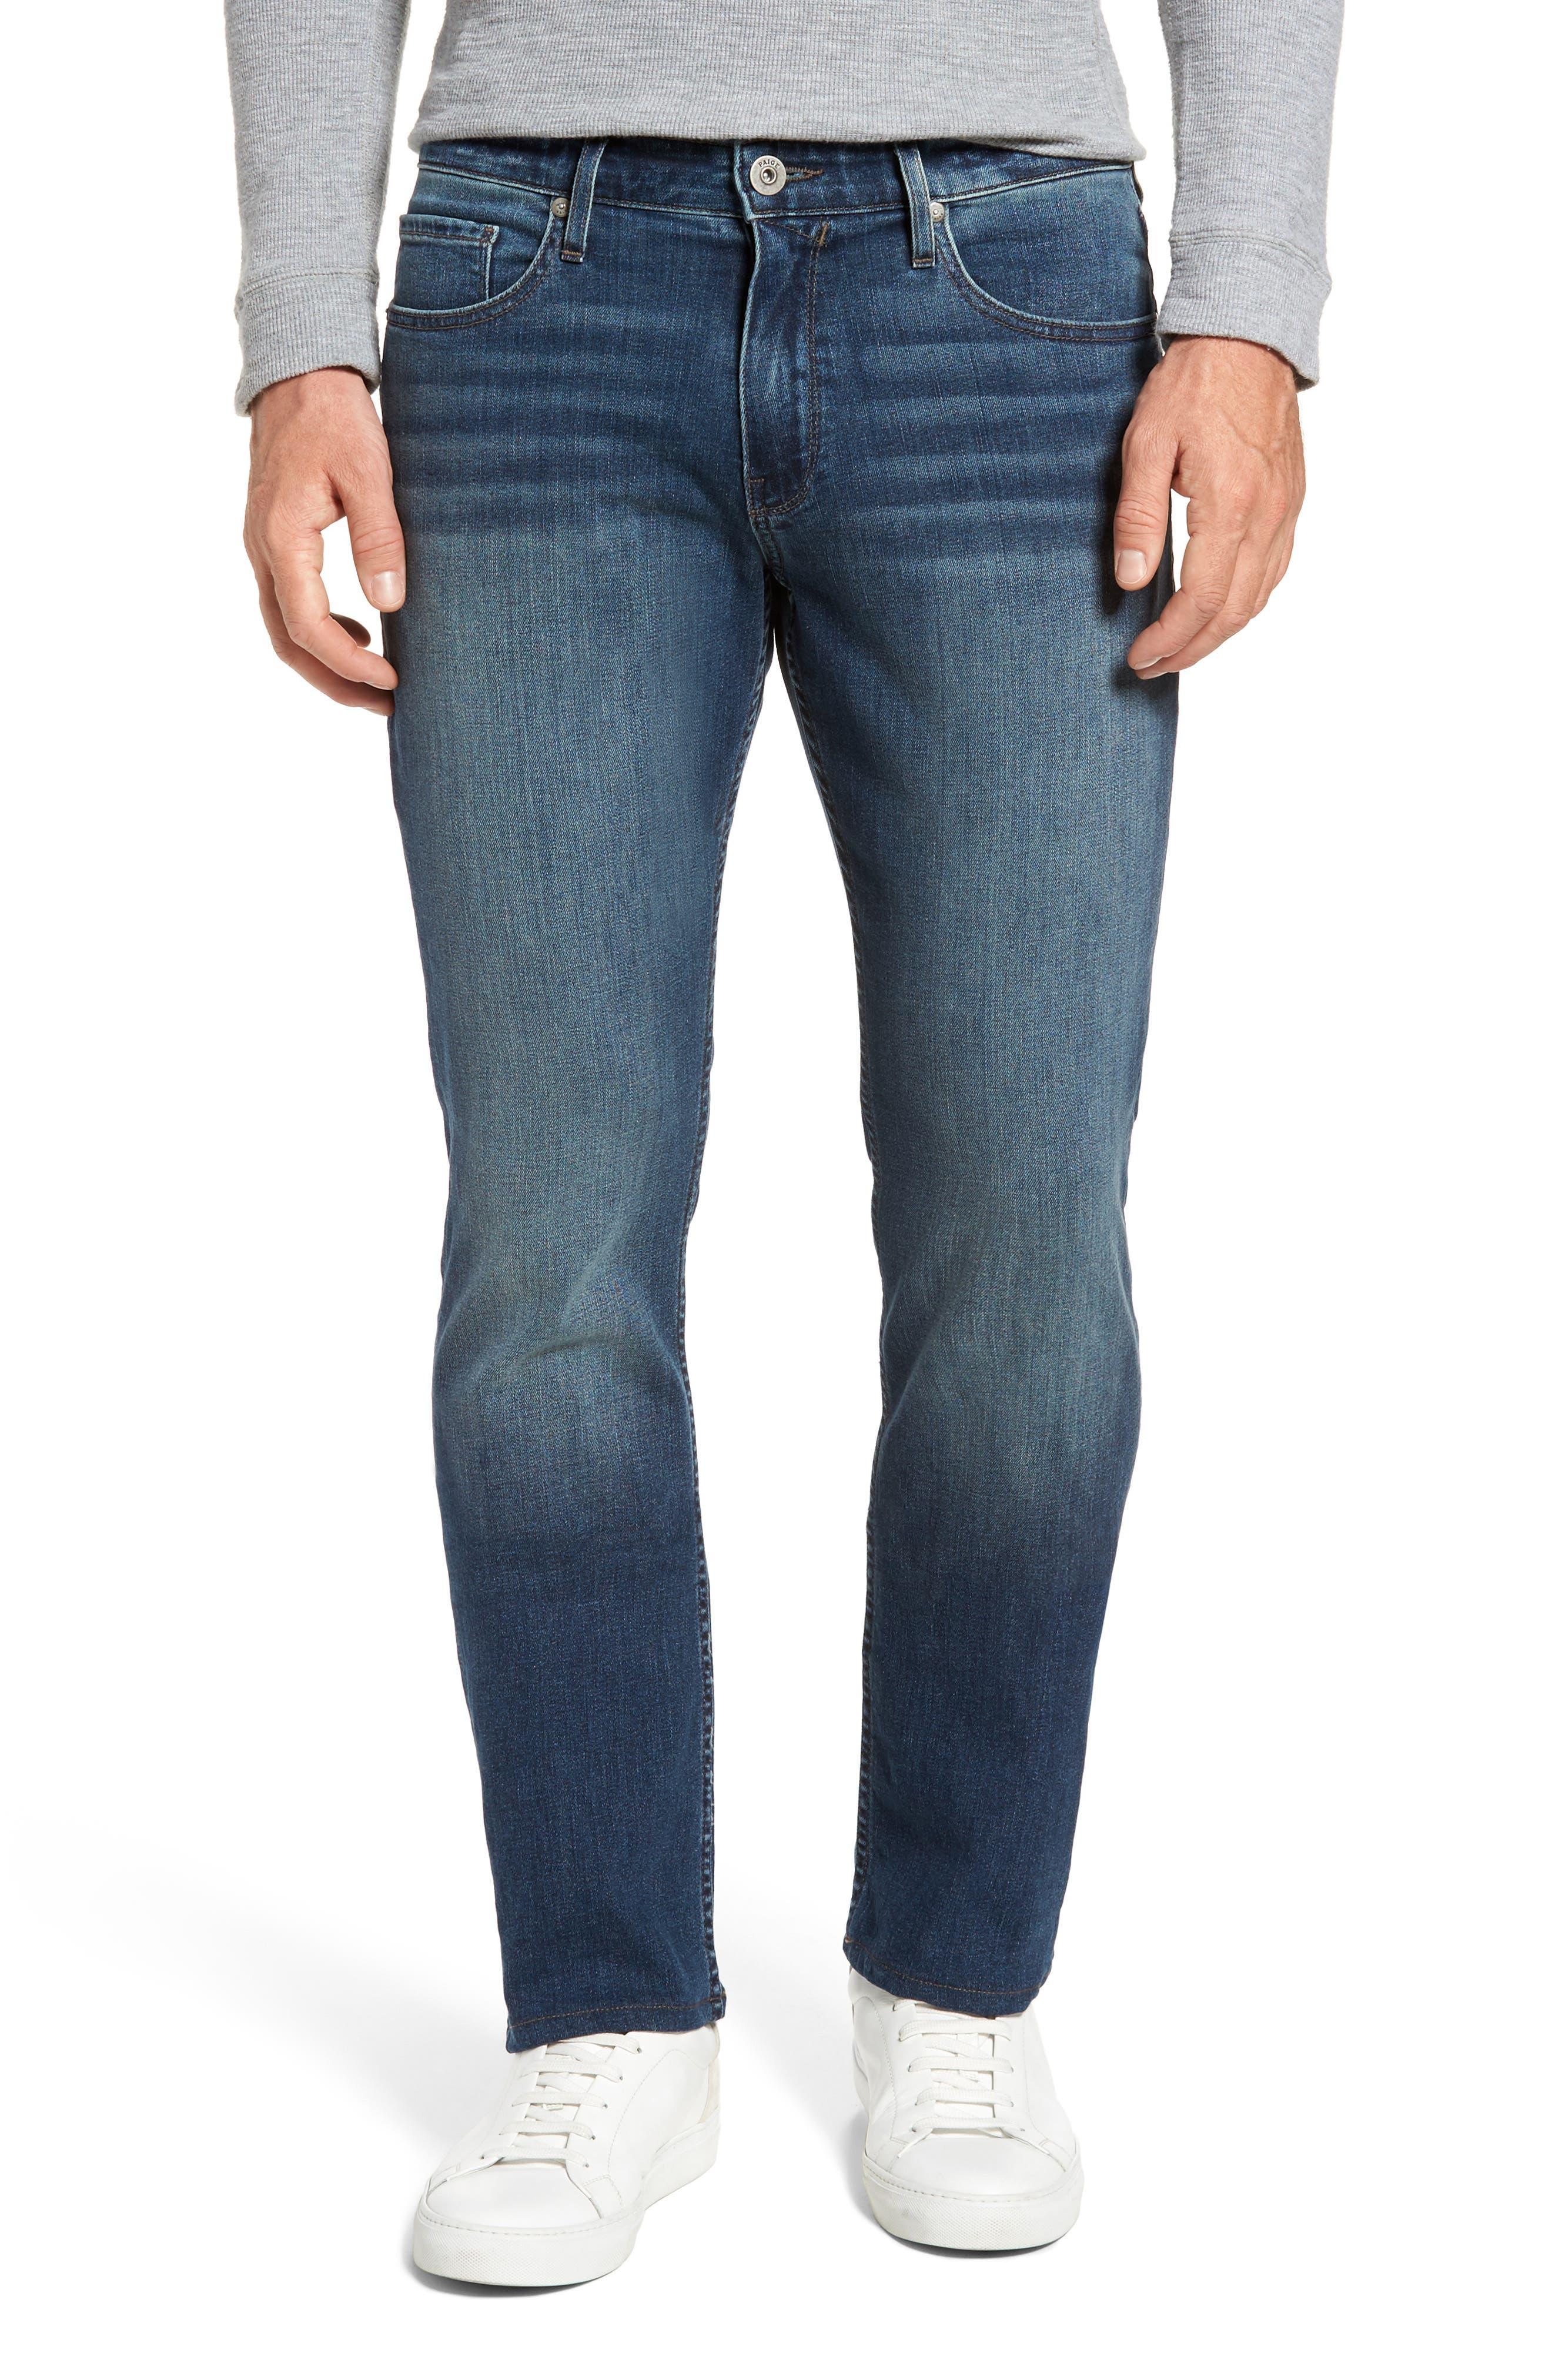 Legacy - Normandie Straight Leg Jeans,                             Main thumbnail 1, color,                             Ewan